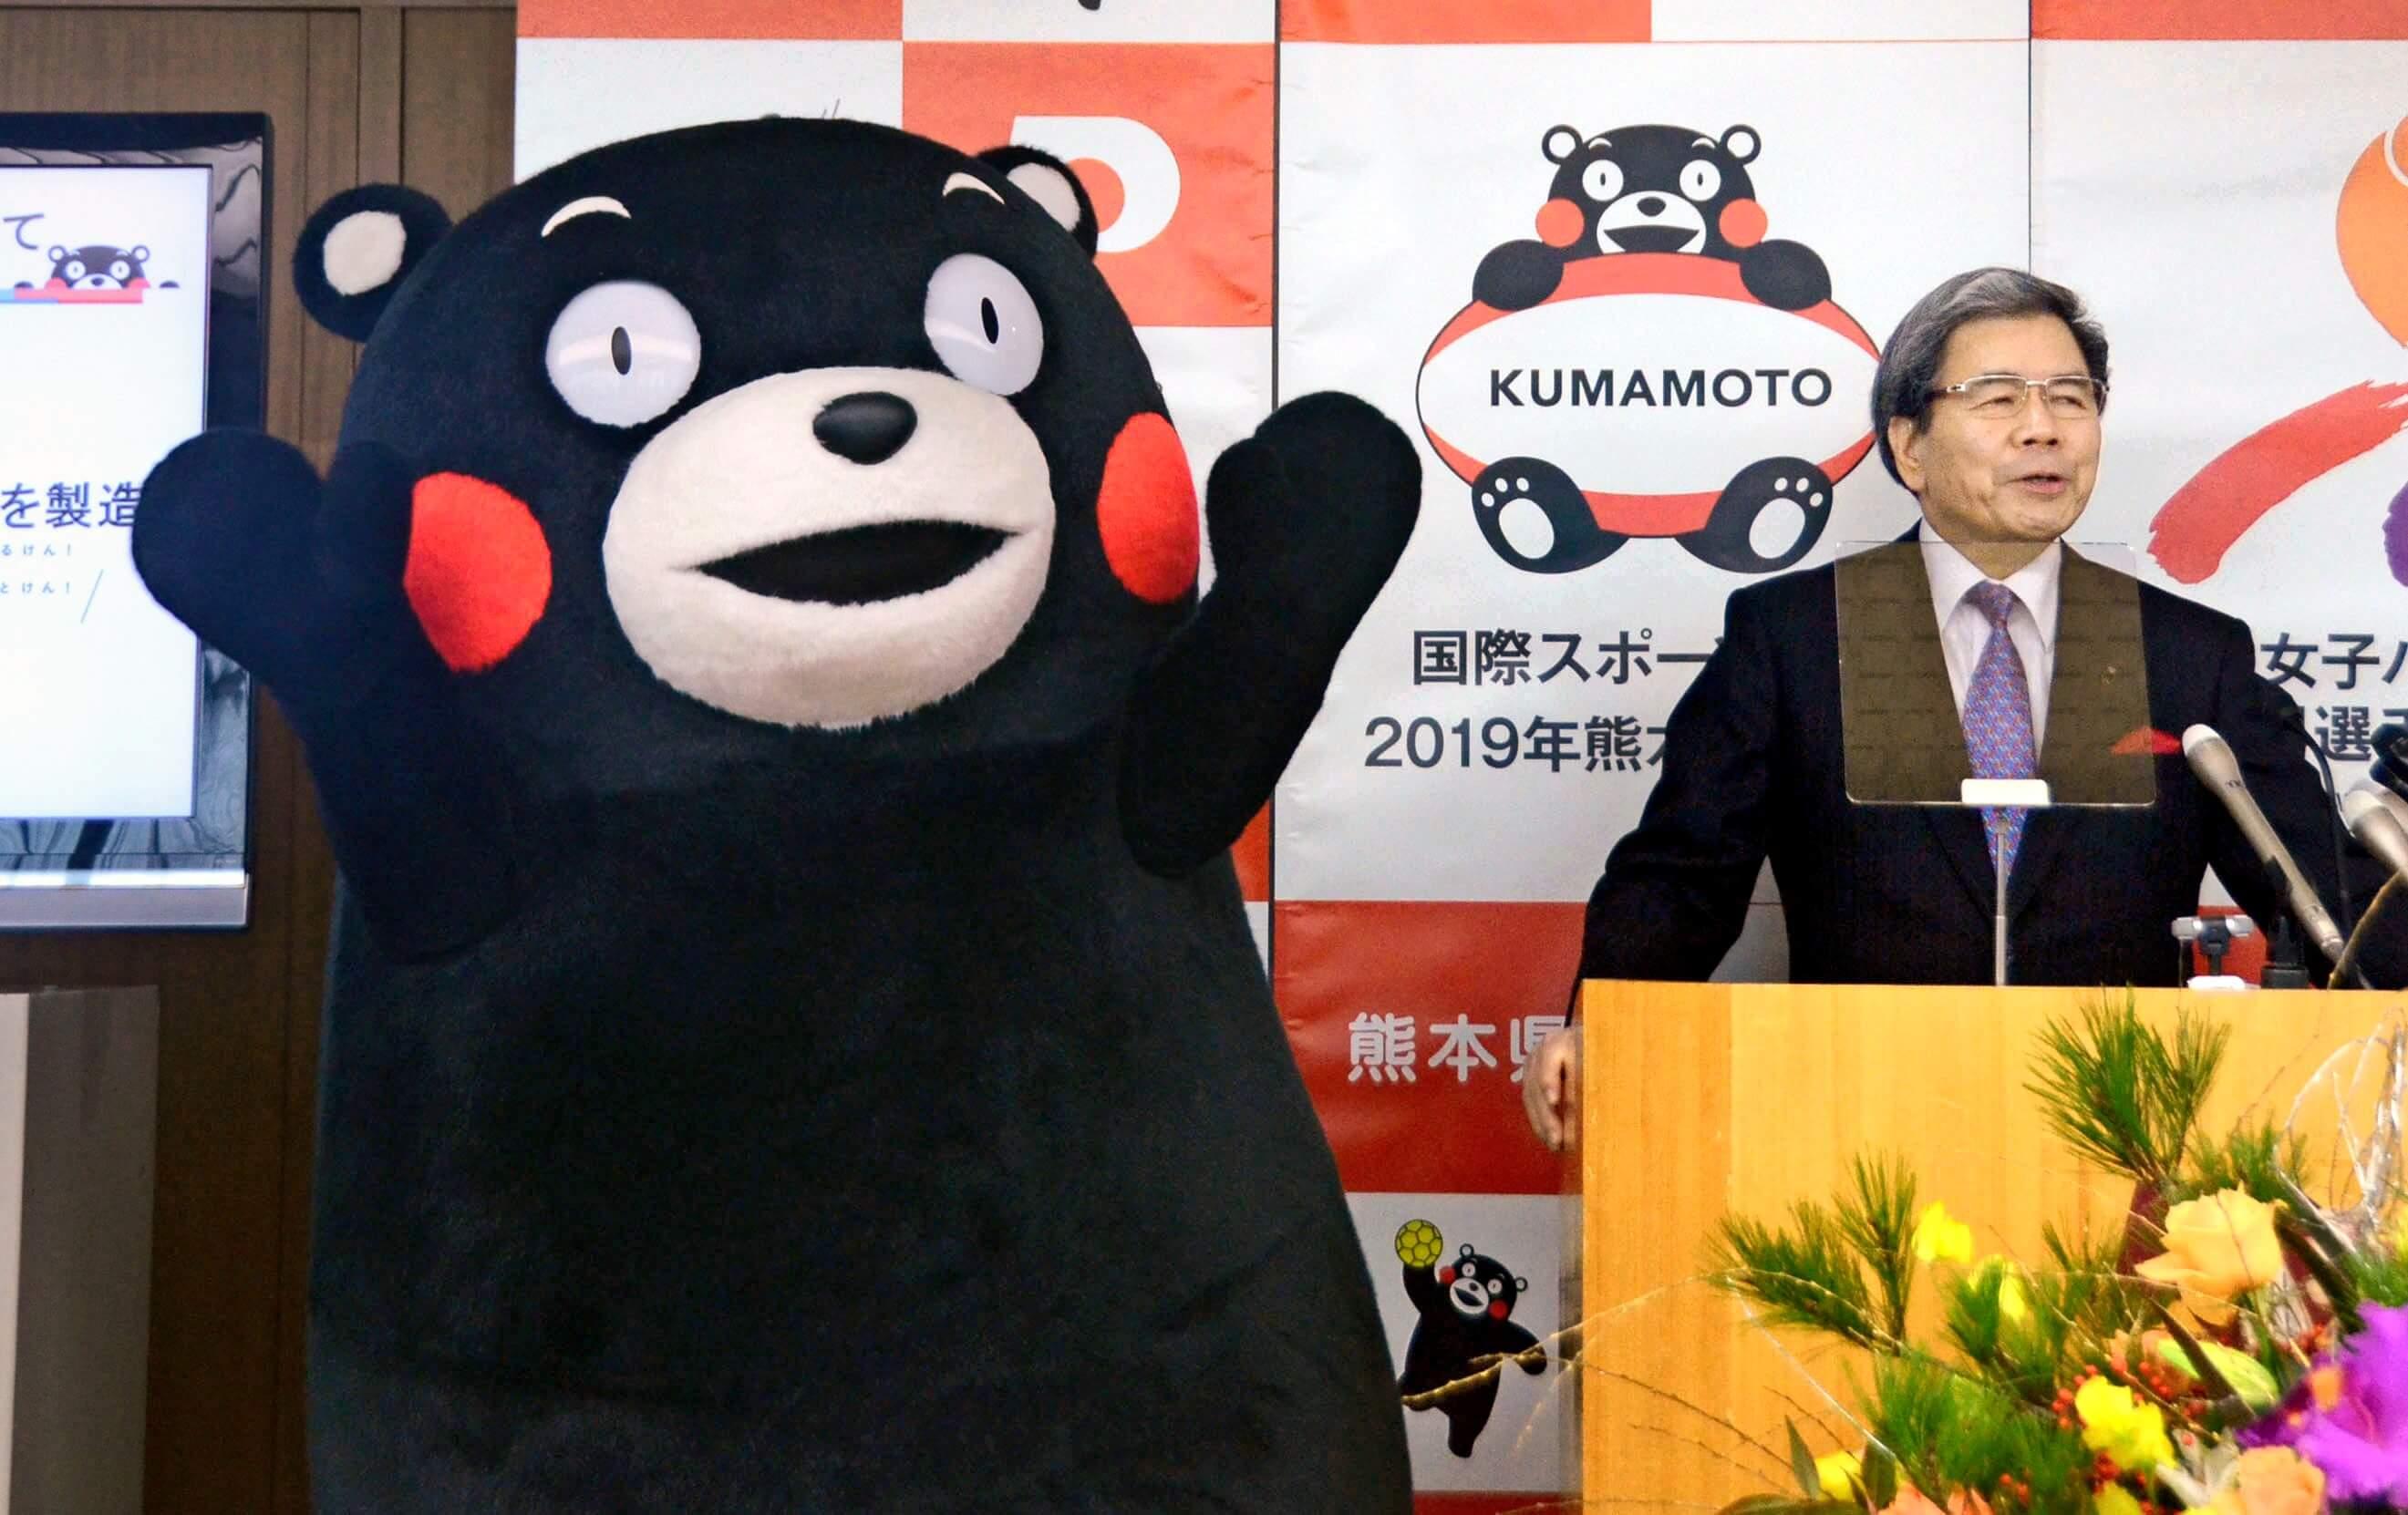 Kumamo - Mascot of Kumamoto Prefecture